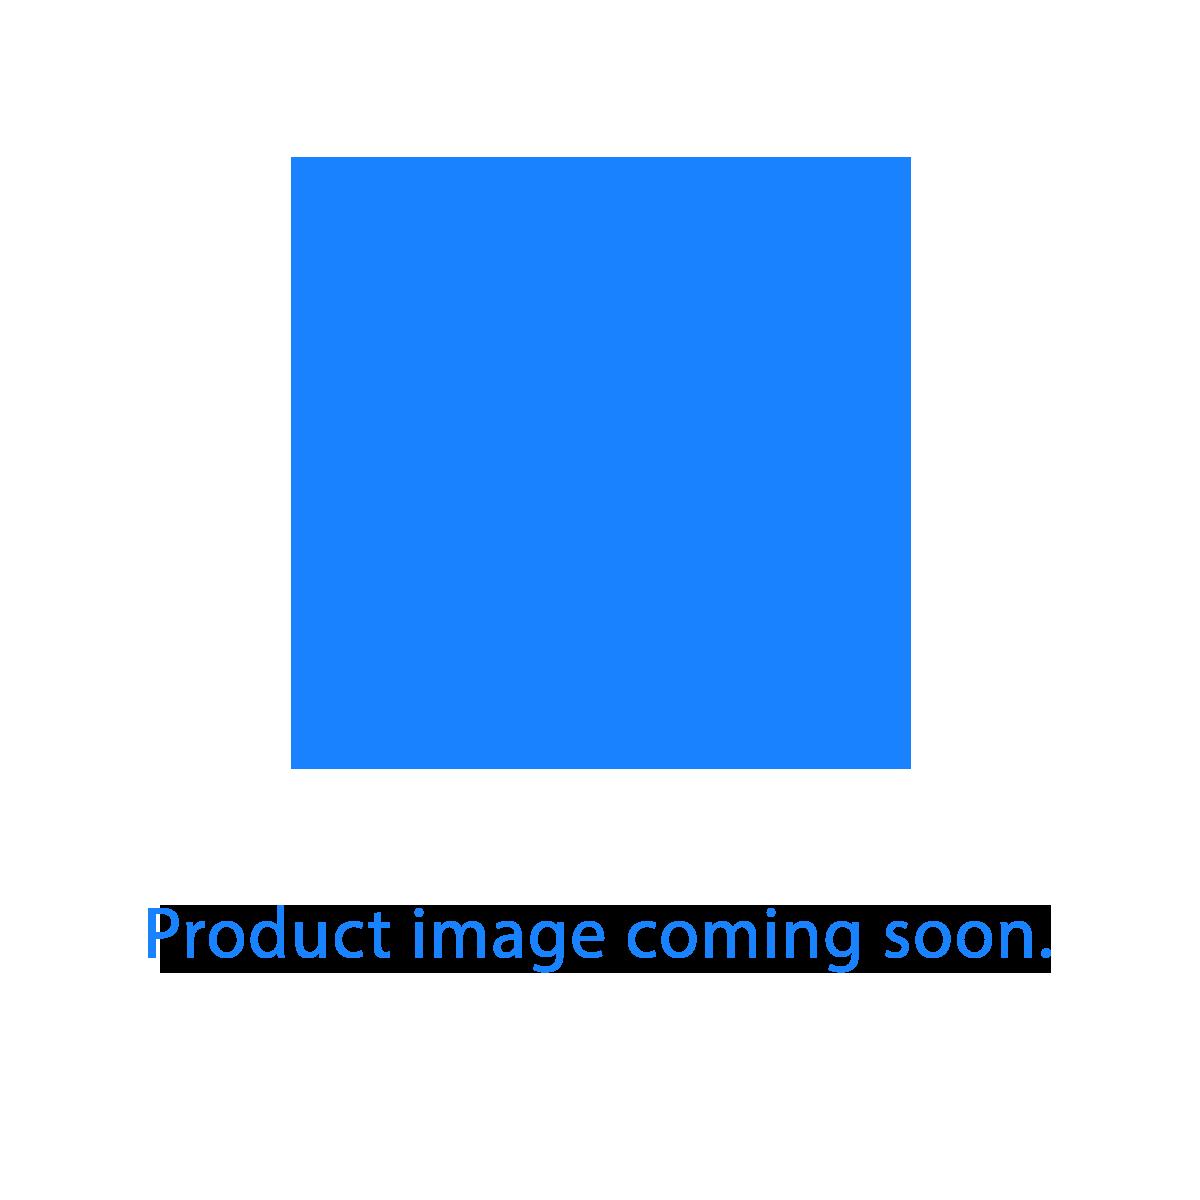 ASUS ZenBook 14 UX425JA-BM065T